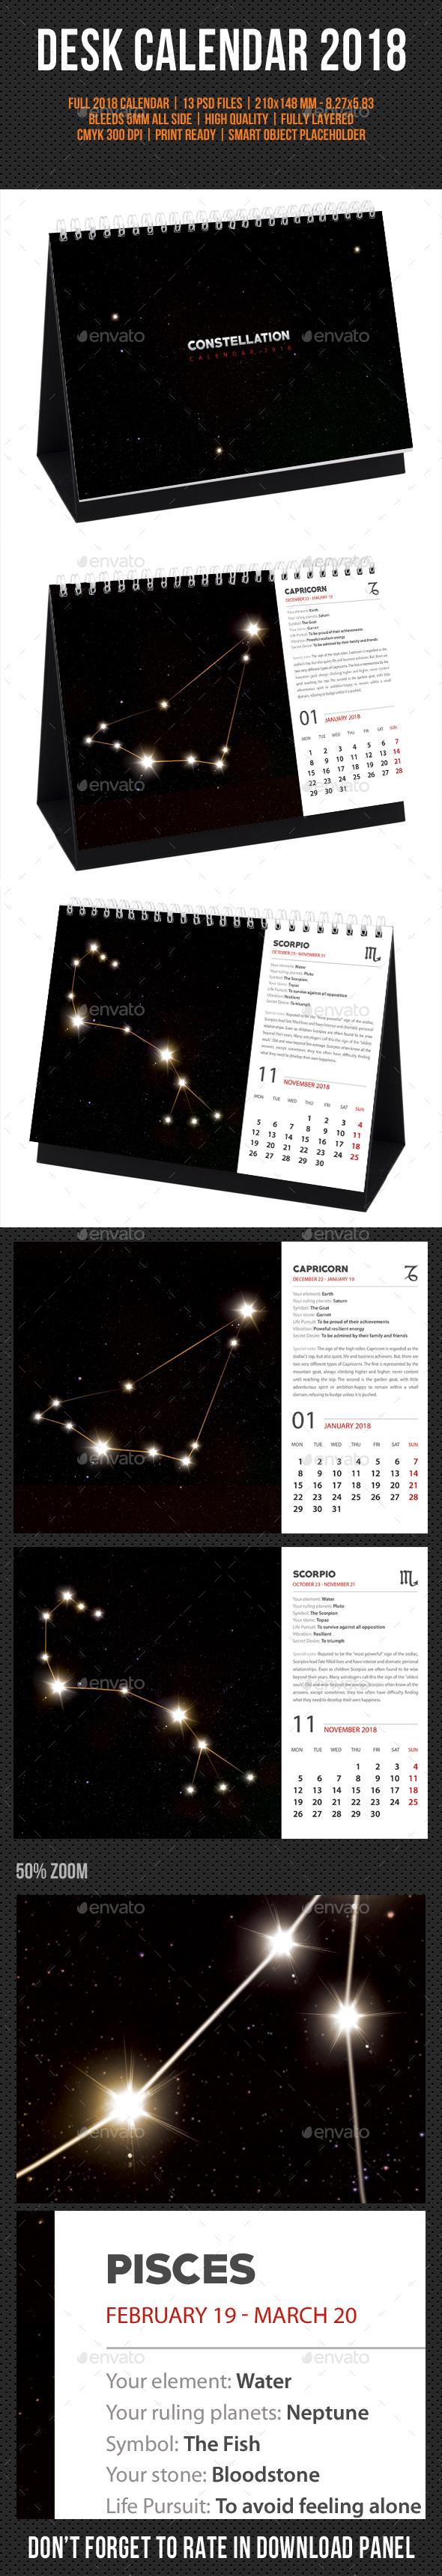 Constellation Desk Calendar 2018 - Calendars Stationery